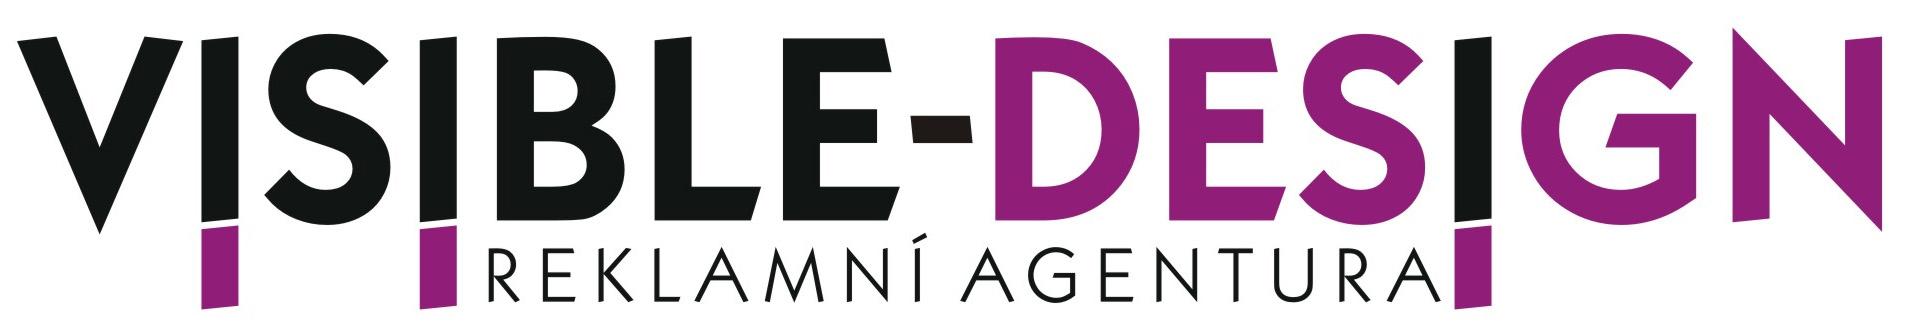 Reklamní agentura Visible Design